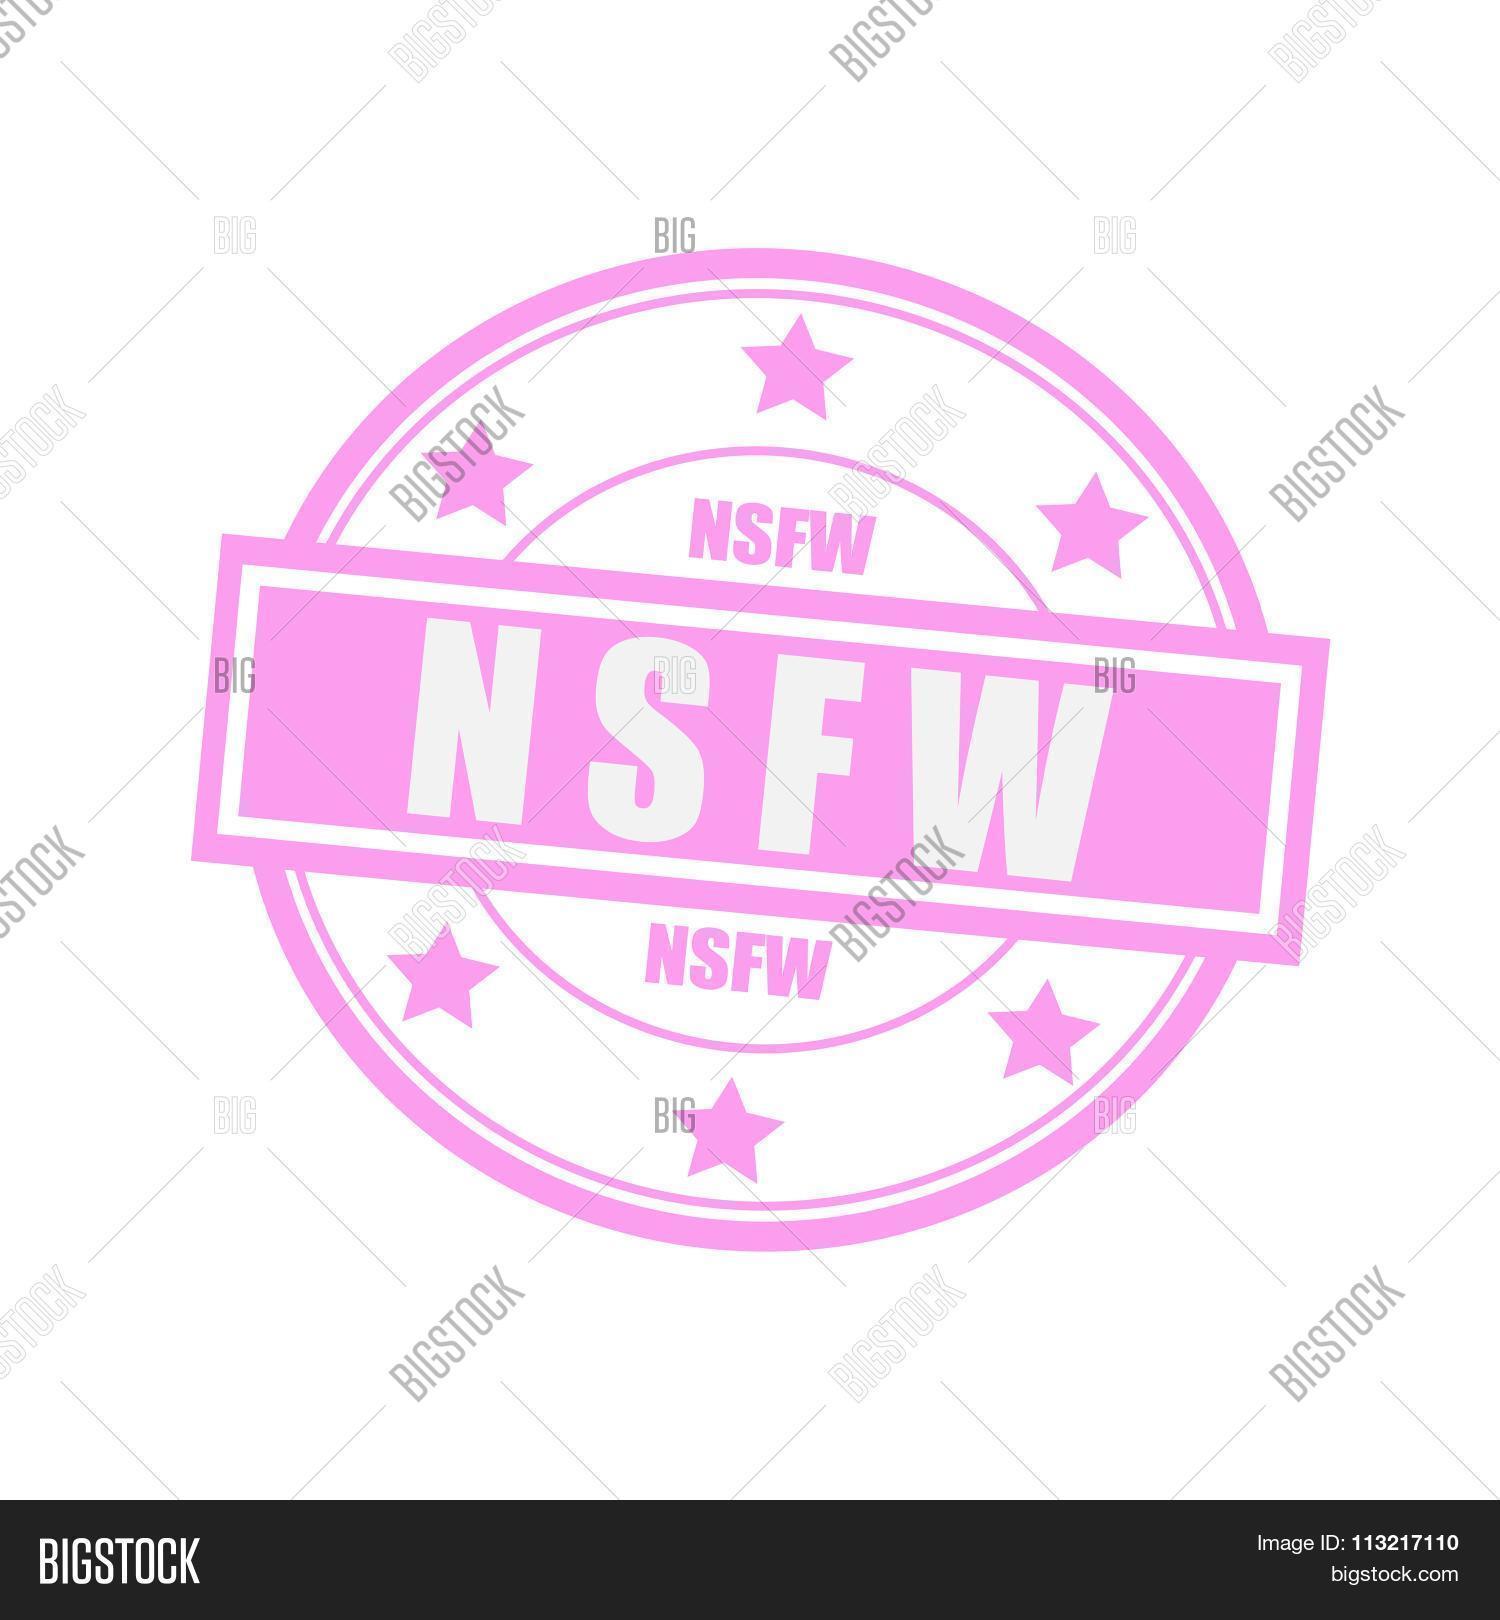 Nsfw White Stamp Text Image & Photo (Free Trial) | Bigstock